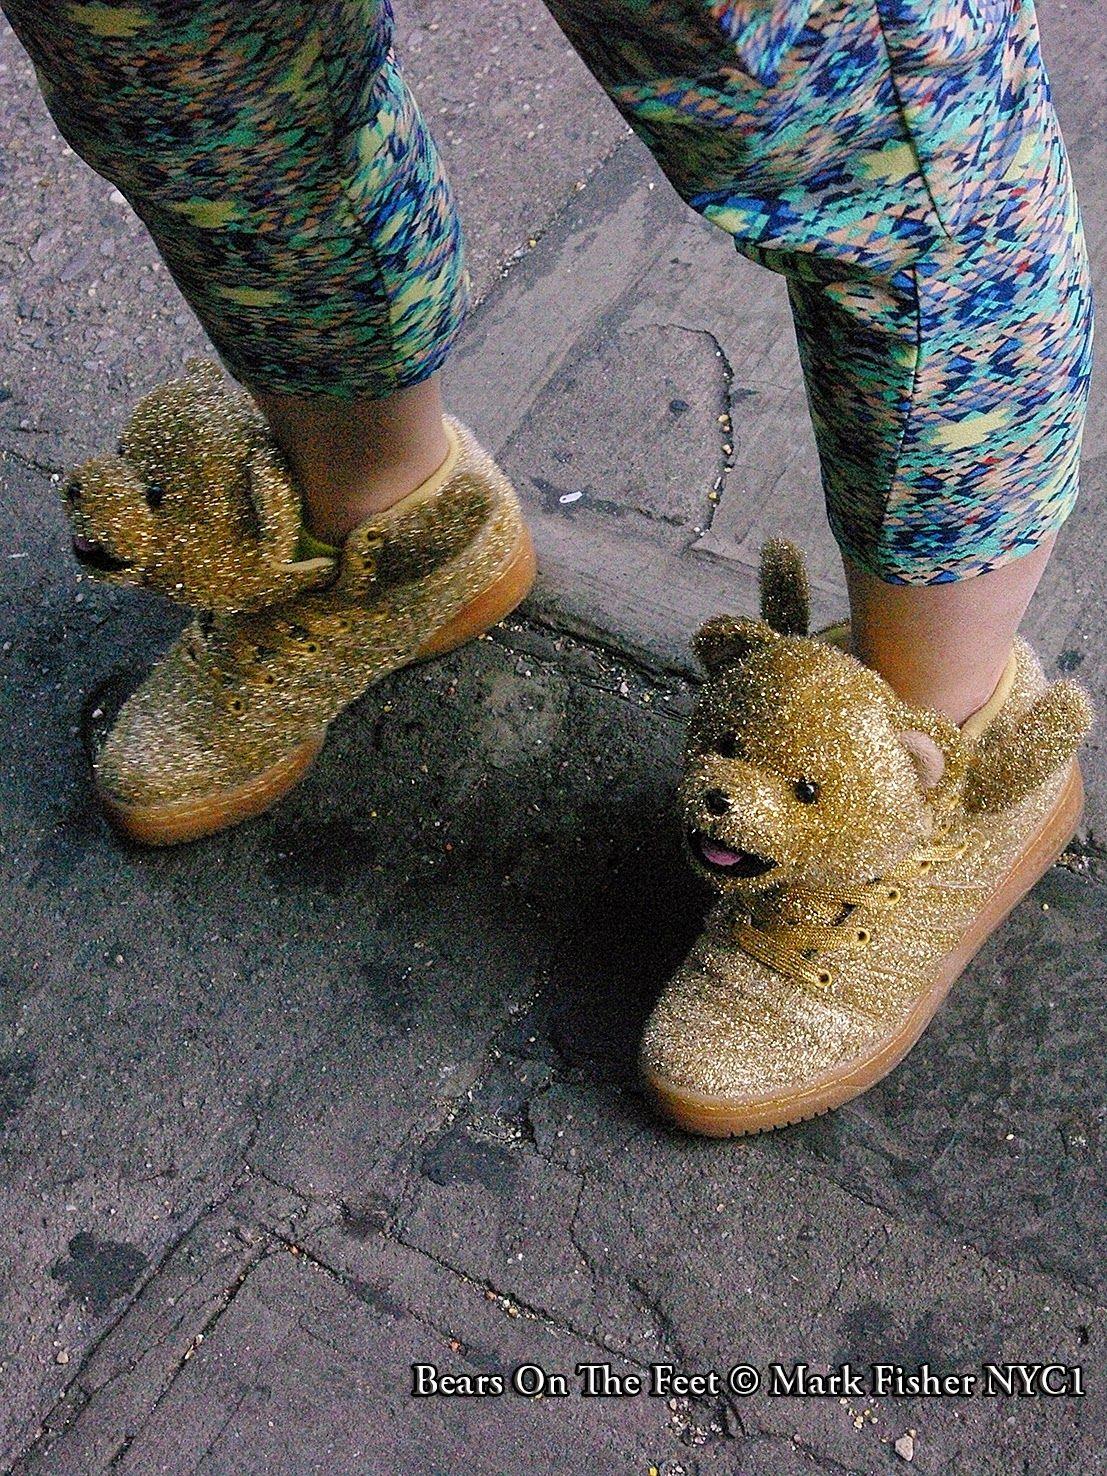 Mark Fisher American Photographer™: Bears On The Feet